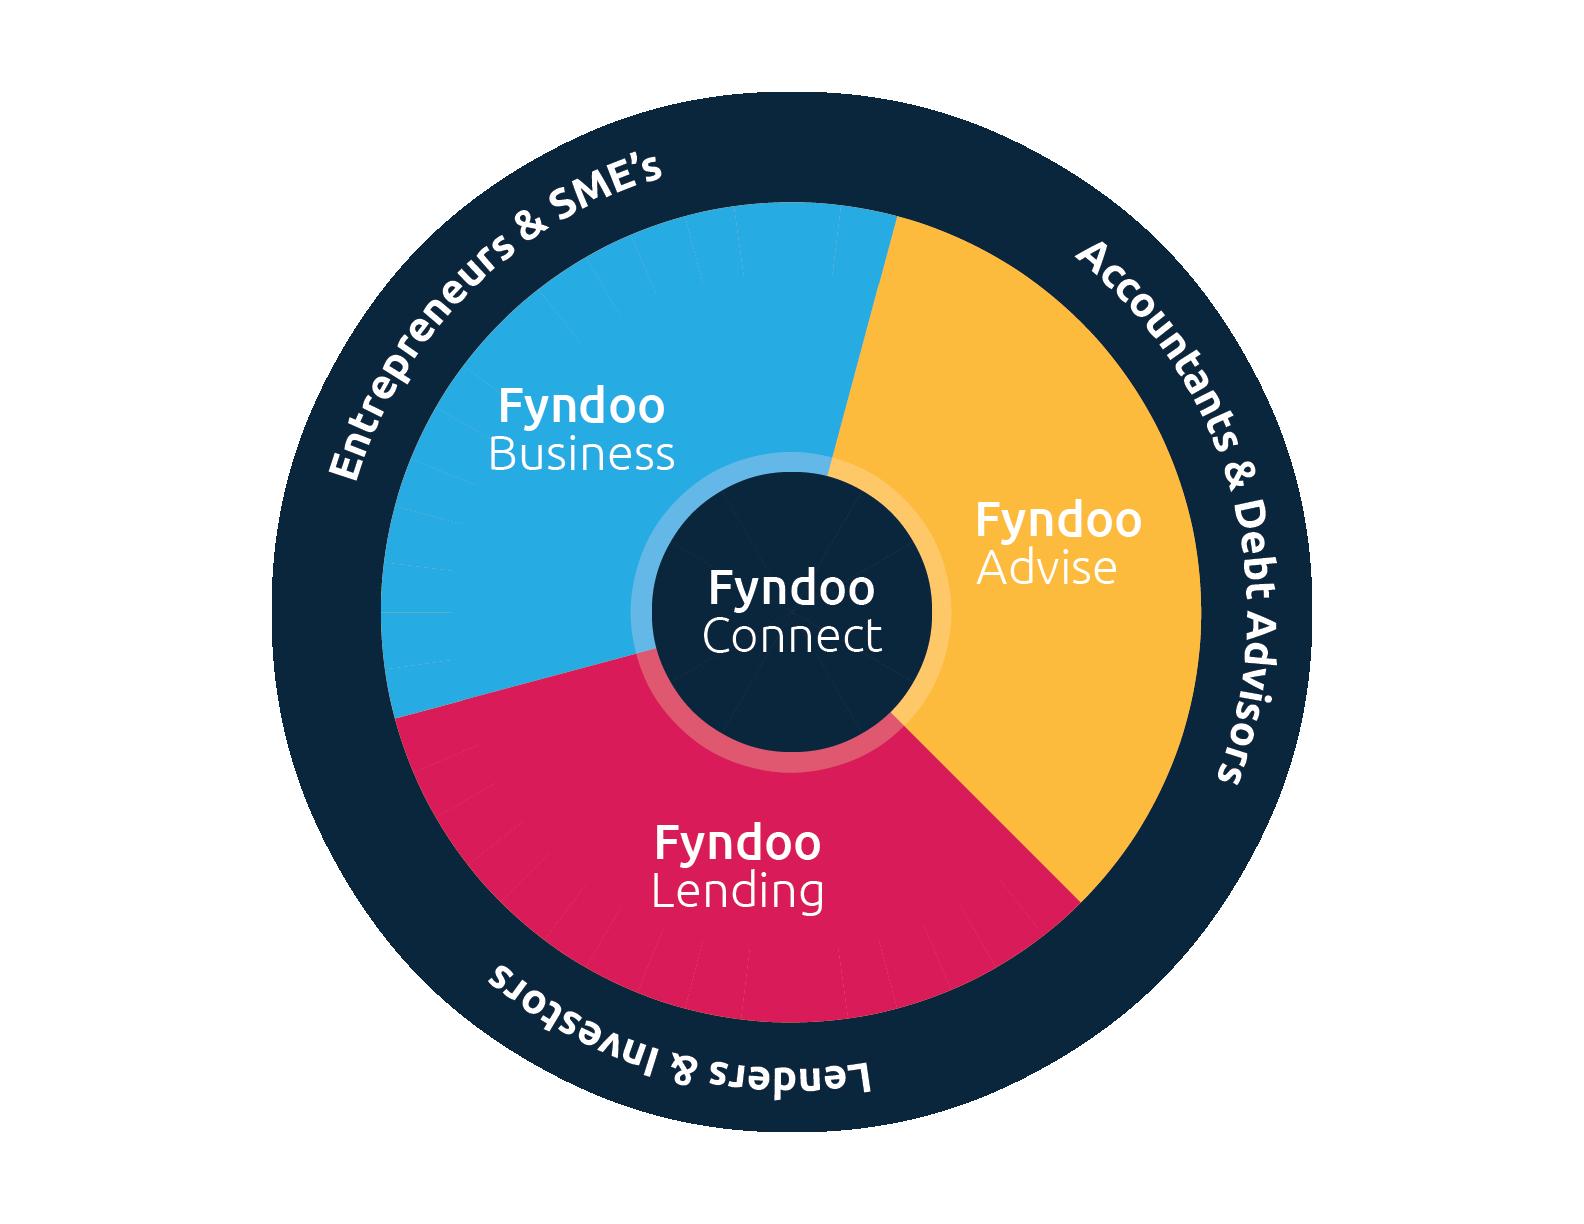 Fyndoo Eco System